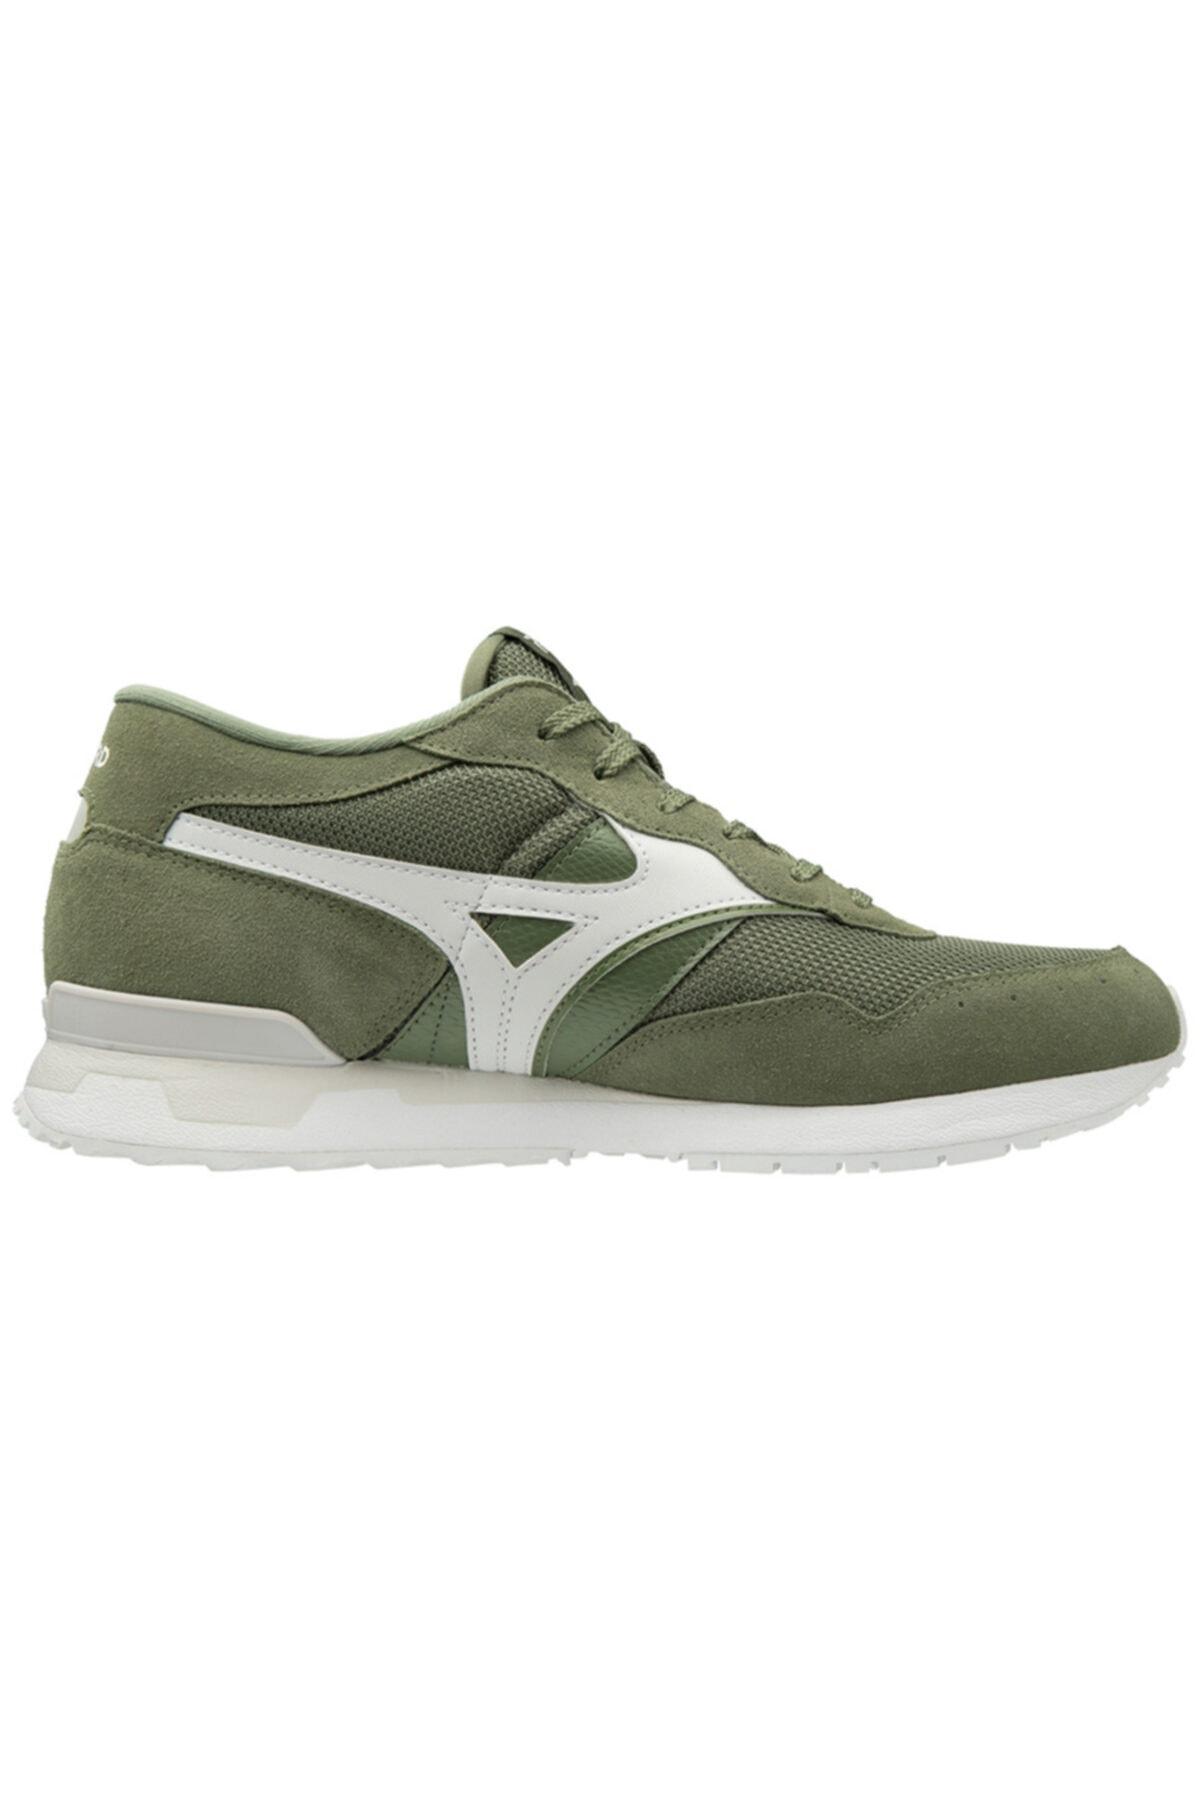 MIZUNO Erkek Sneaker - D1Ga190938 Genova 87 - D1GA190938 2